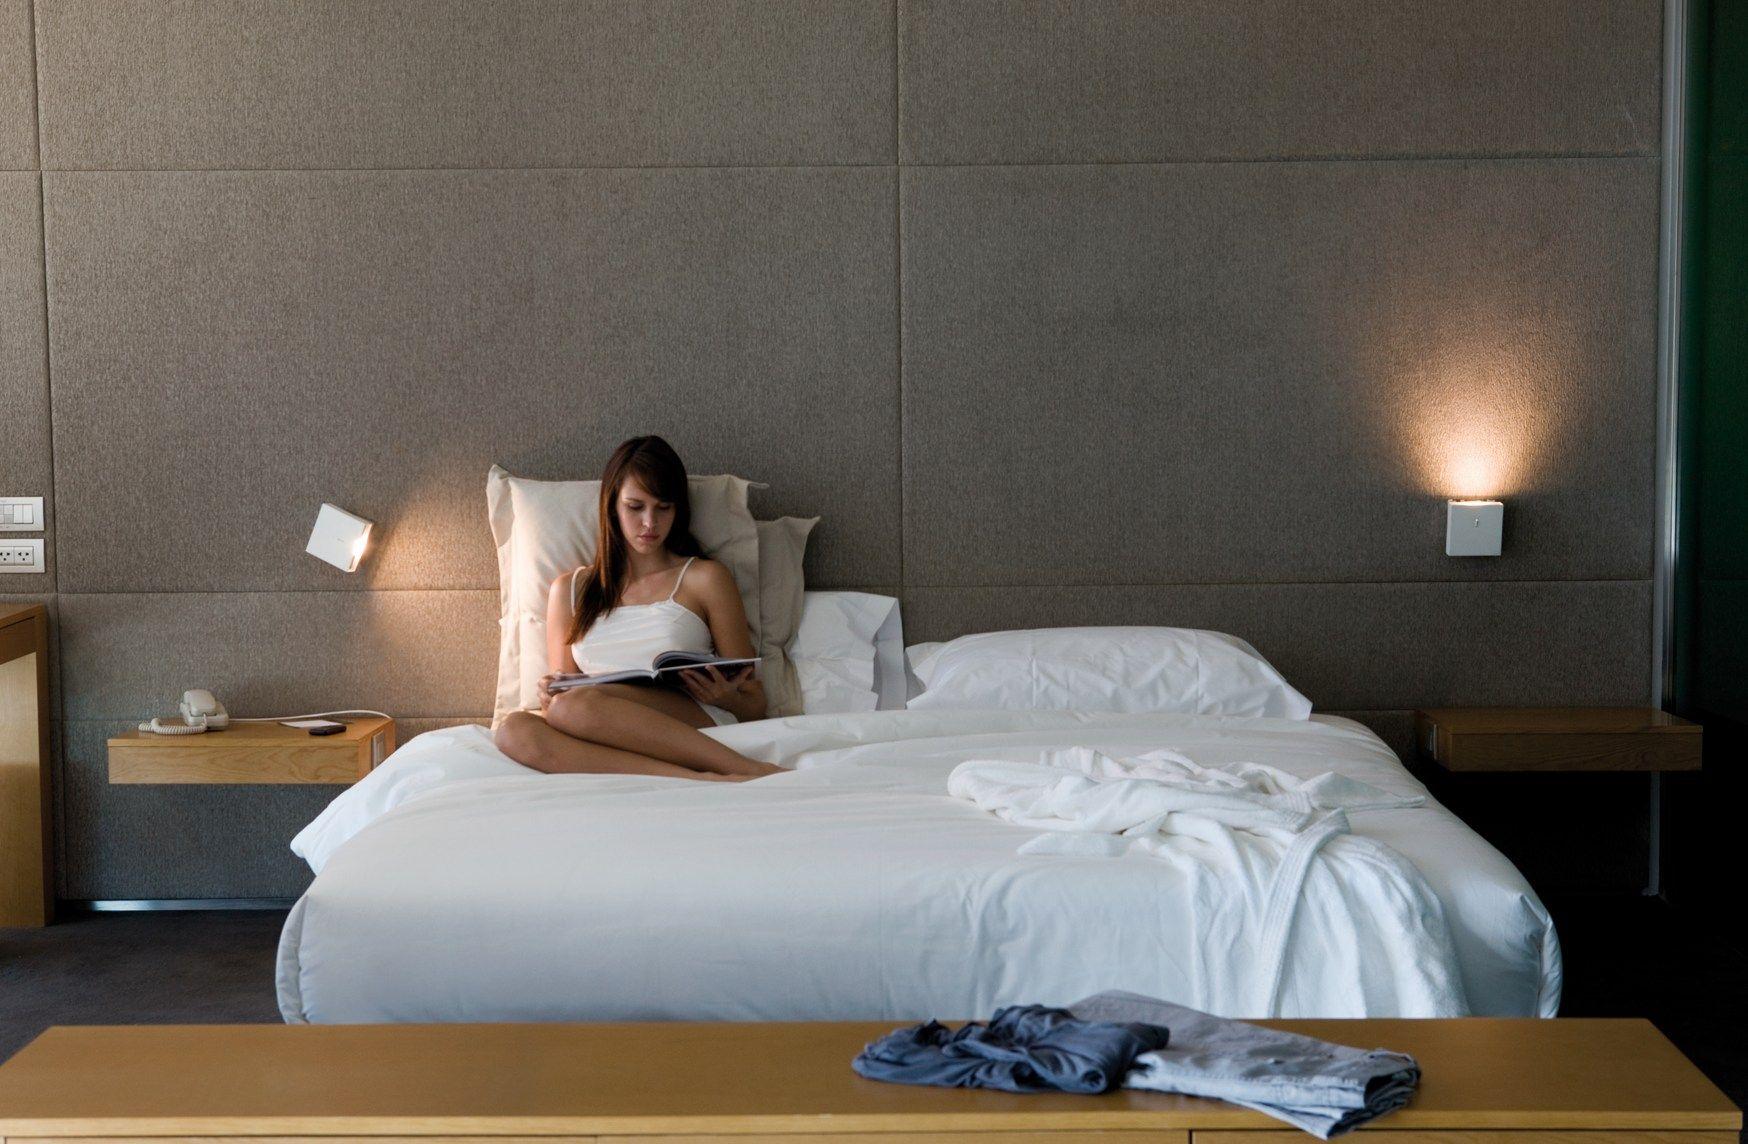 Clairage de chambre coucher cr ation d ambiances avec - Lampara para dormitorio moderno ...